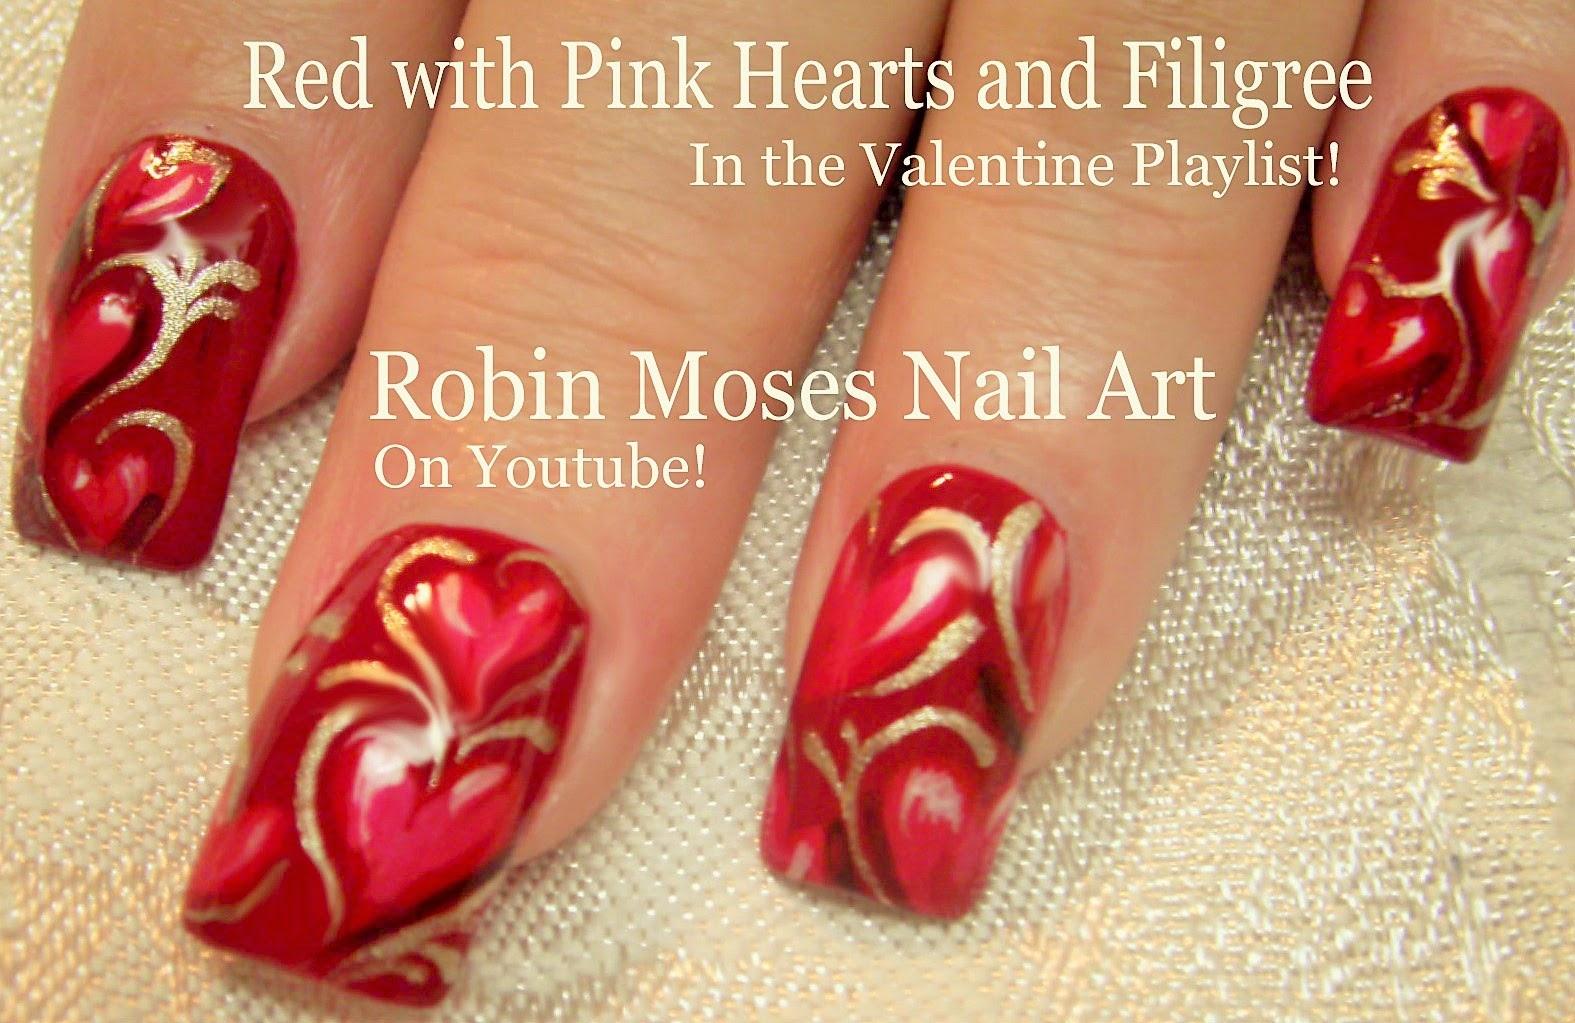 Nail Art By Robin Moses Valentine Nails Valentine Nail Art